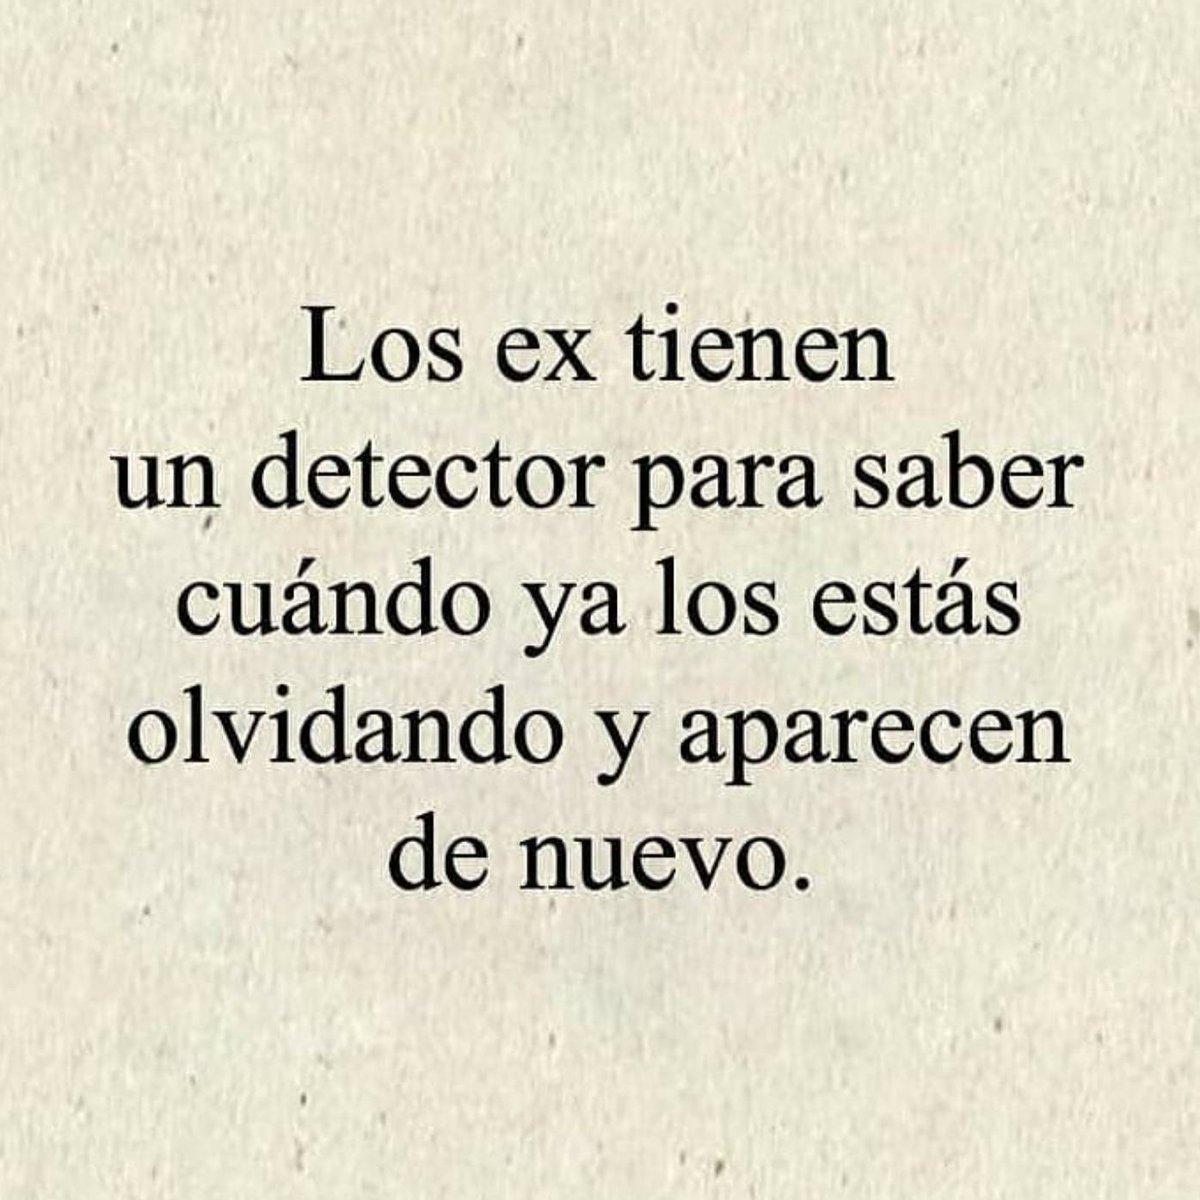 Quijotadas De Amor On Twitter Quijotadasdeamor Los Ex